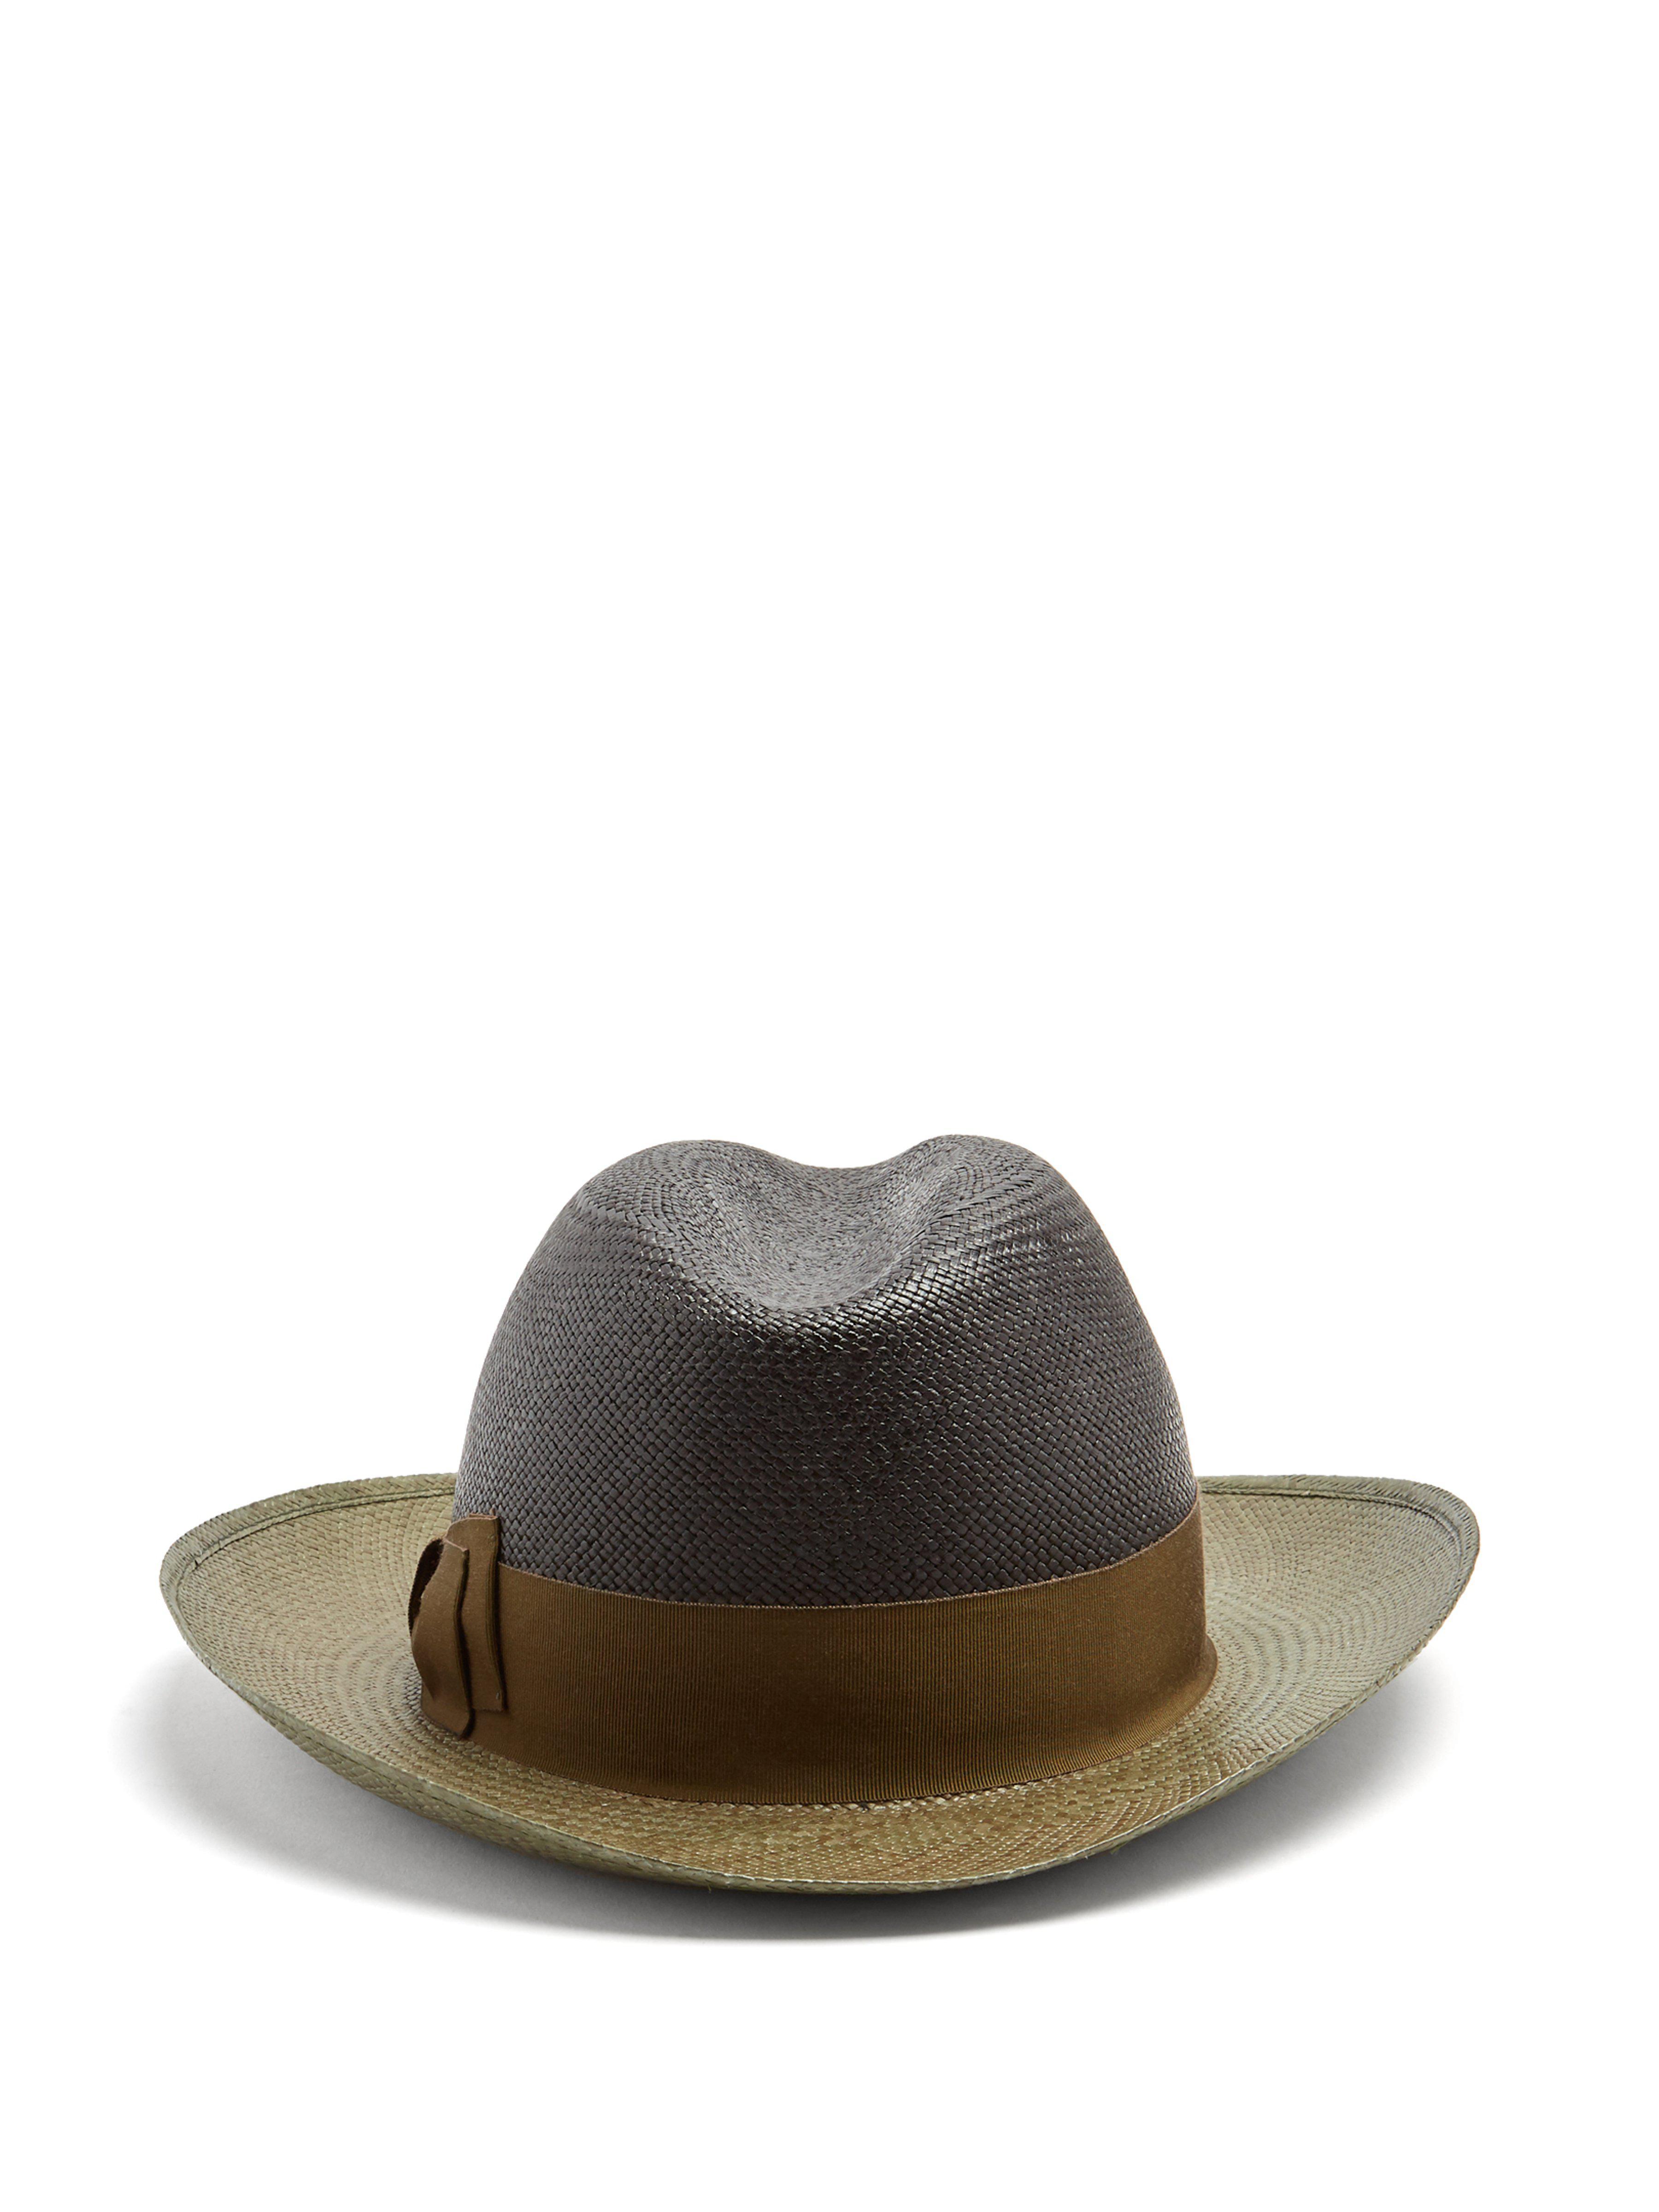 Borsalino - Multicolor Bi Colour Bow Embellished Panama Hat for Men - Lyst.  View fullscreen df3887f3784d